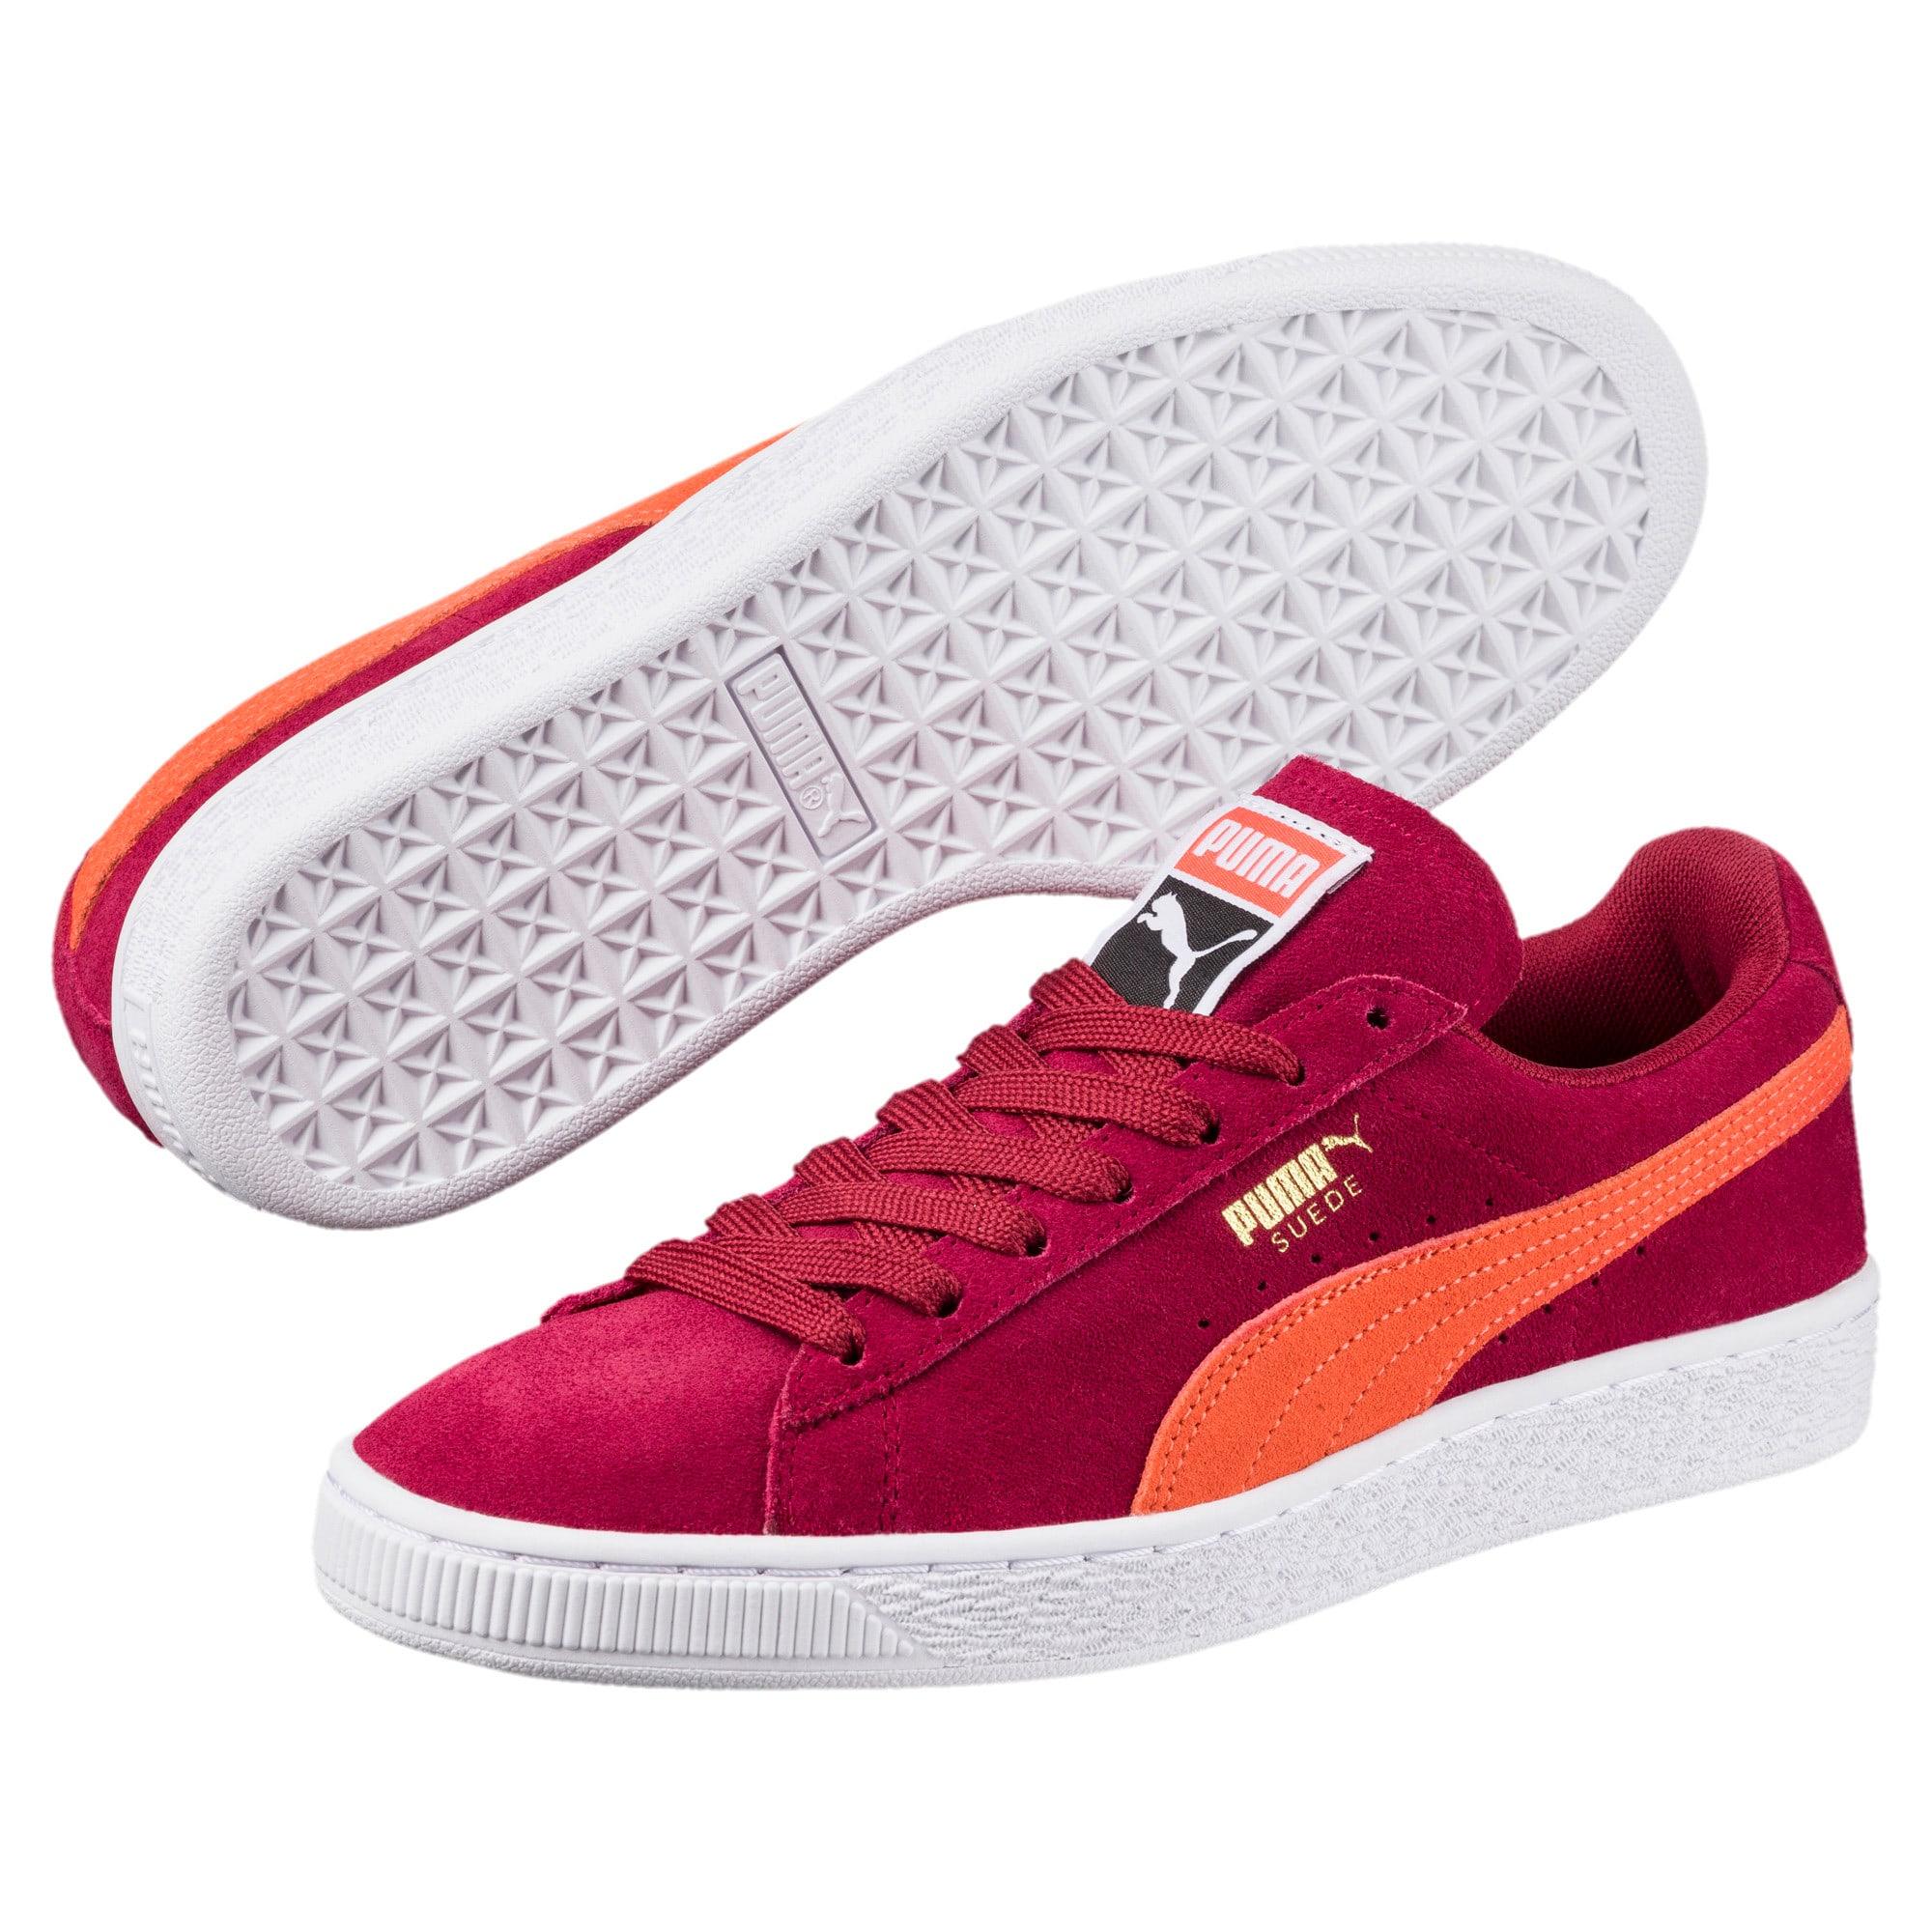 Thumbnail 2 of Suede Classic Women's Sneakers, Tibetan Red-Hot Coral, medium